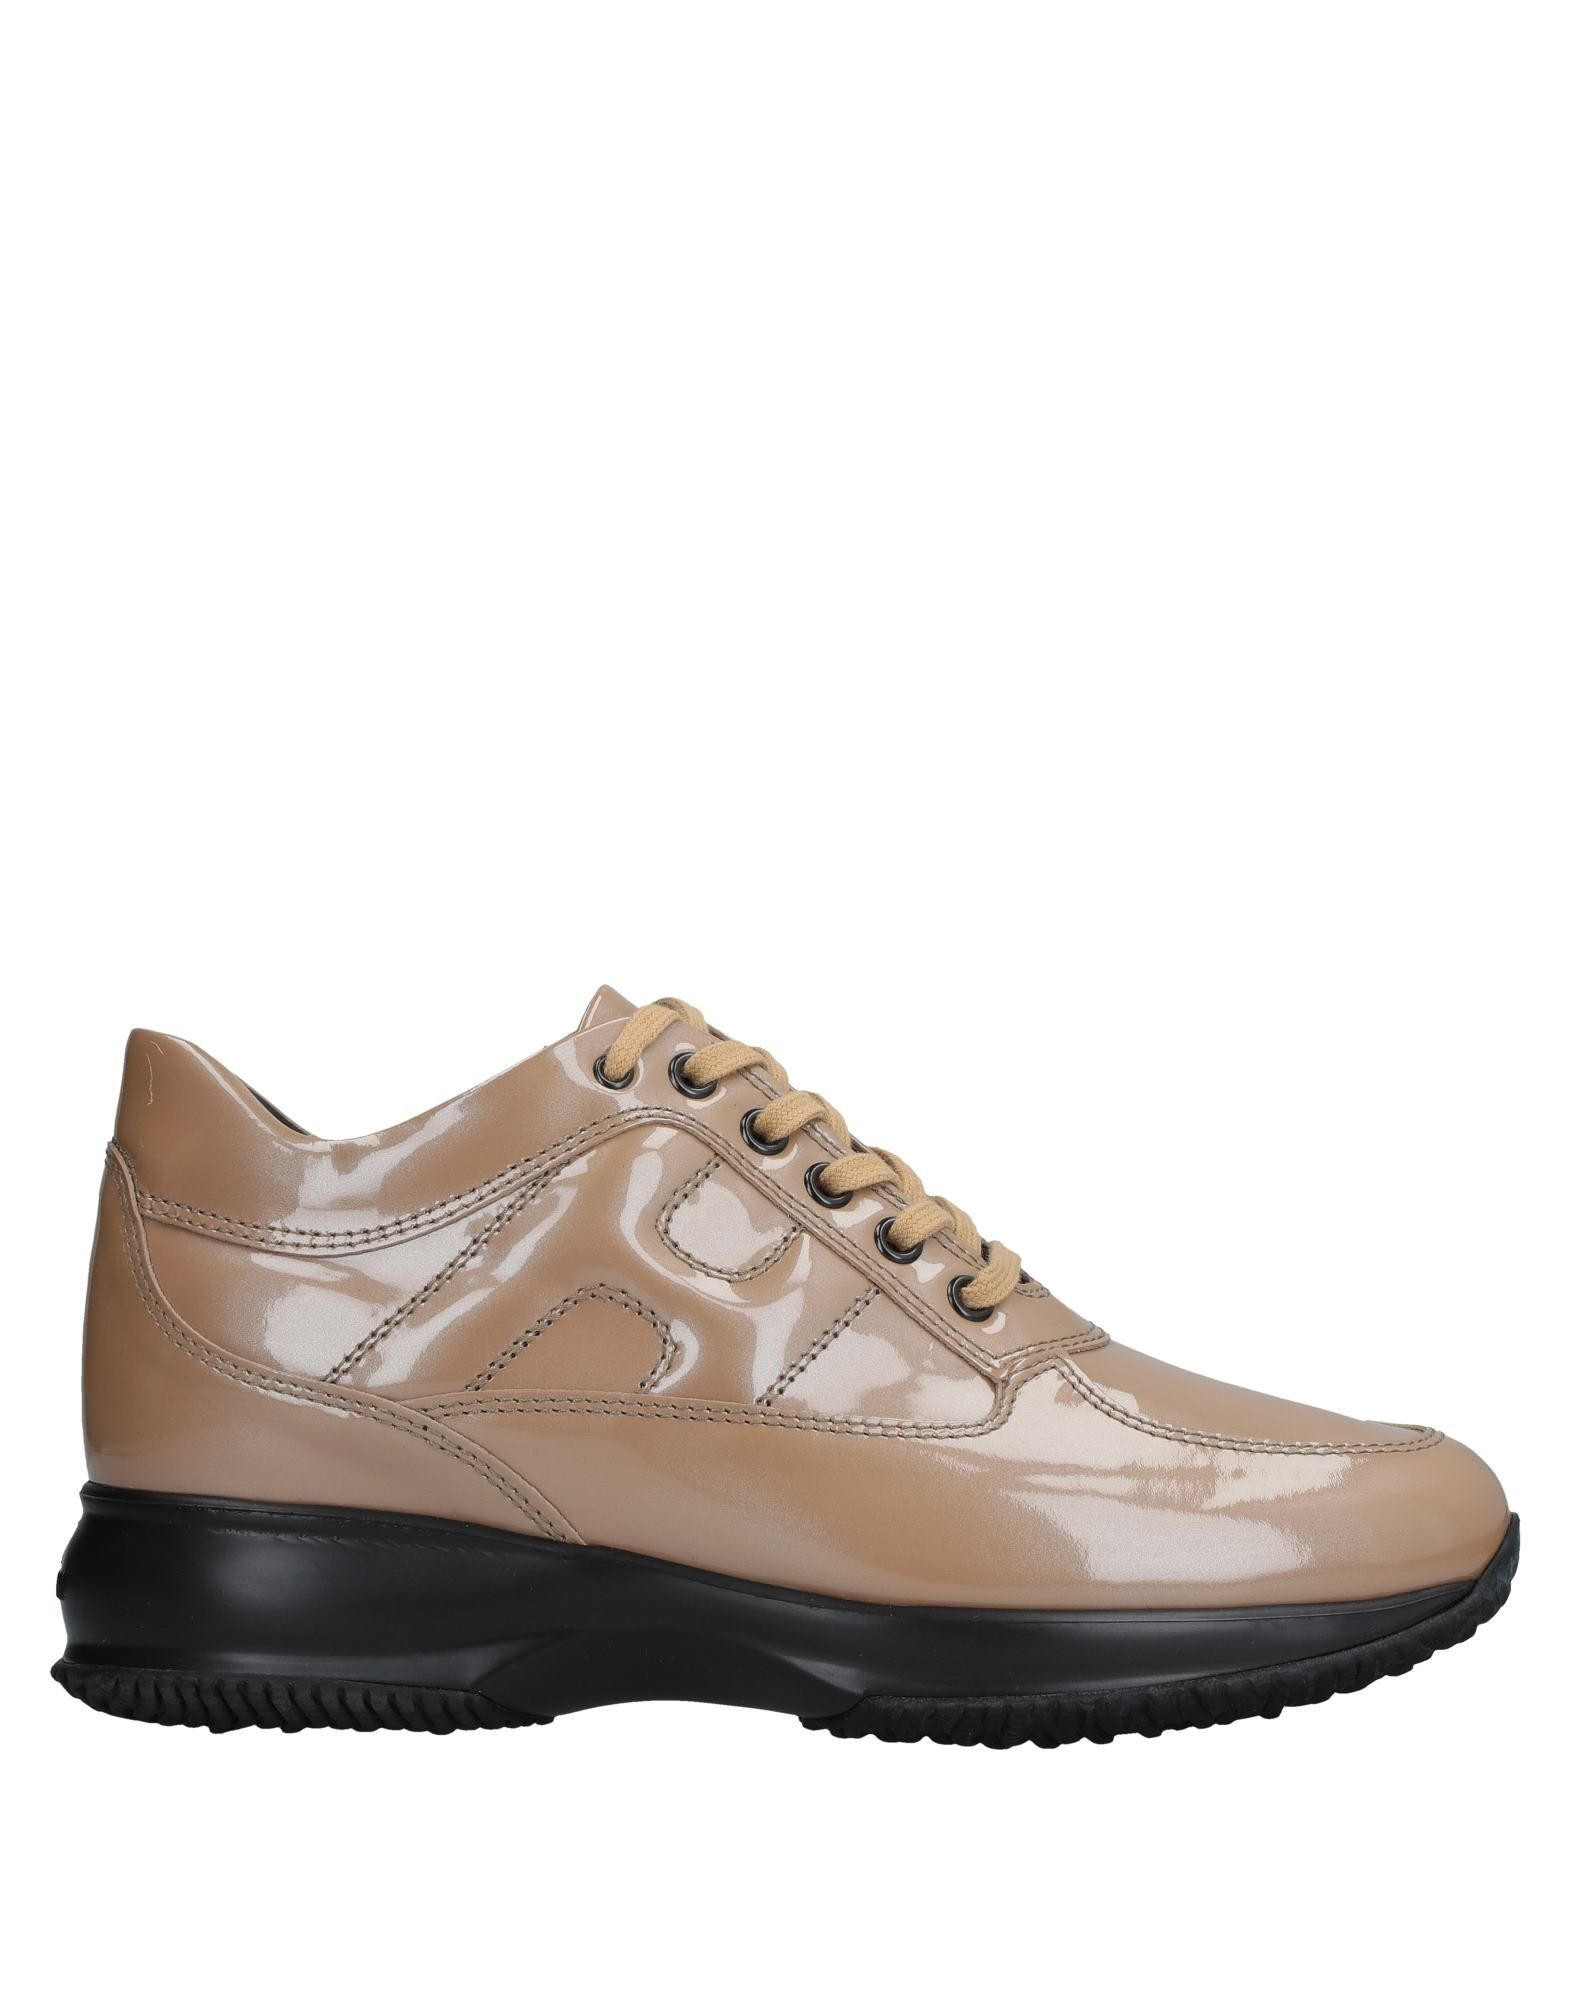 Moda Sneakers Hogan Donna - 11541874IN